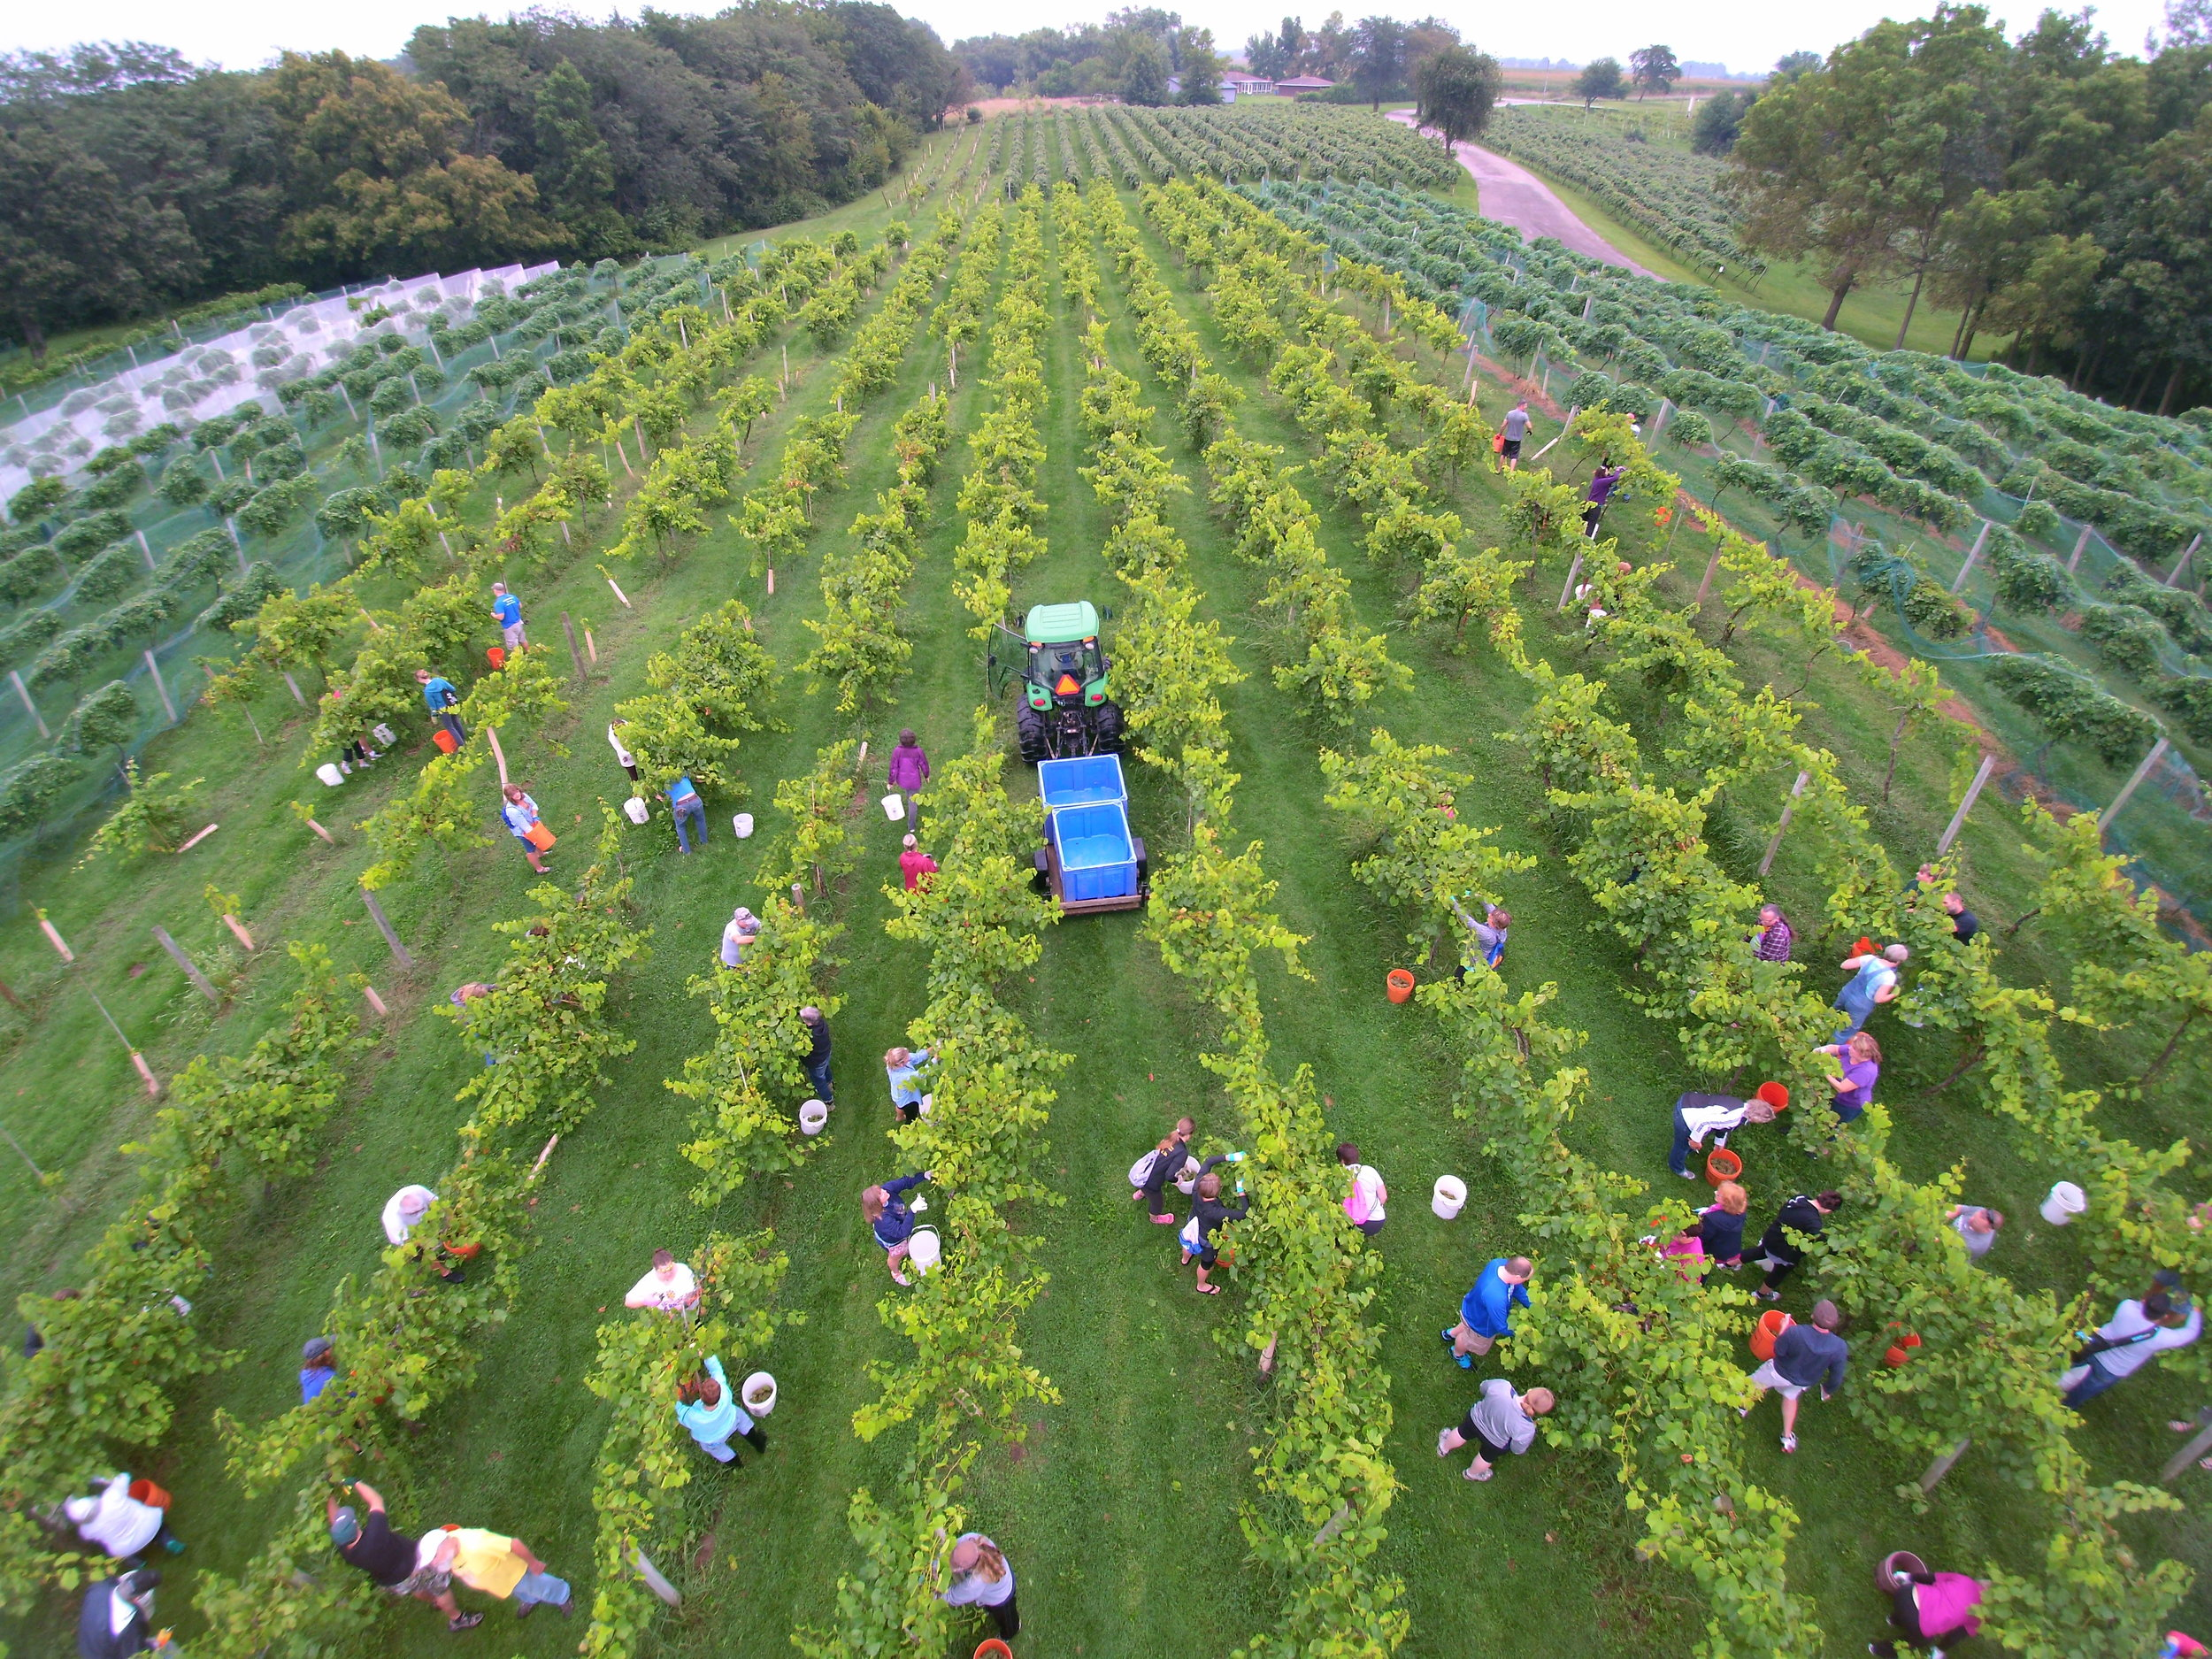 Summerset Winery Harvest Drone View.jpg